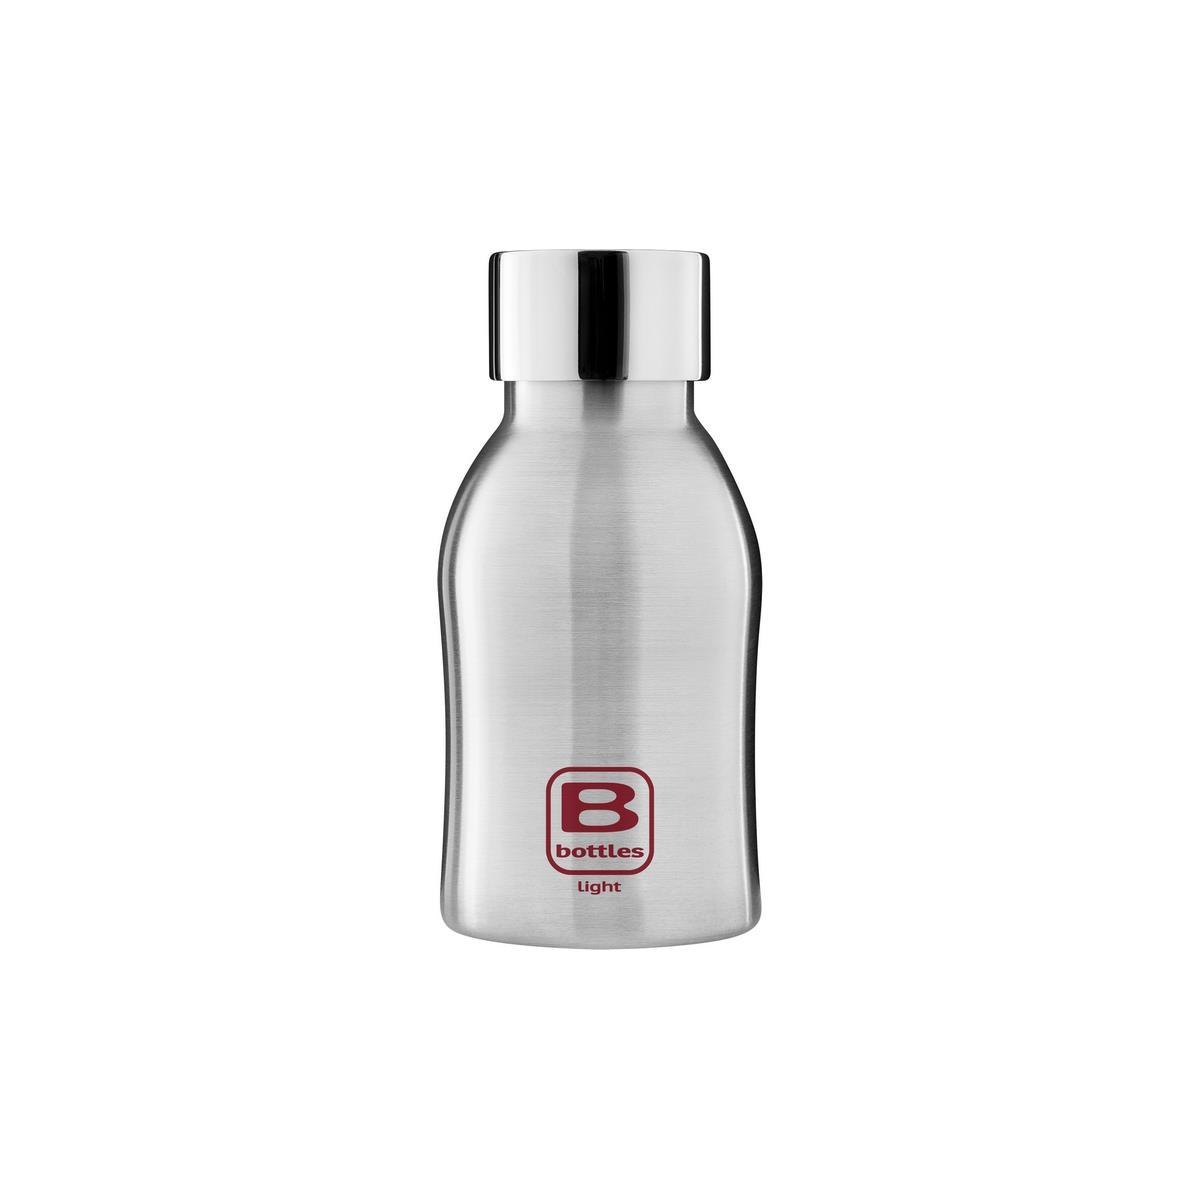 B Bottles Light - Steel Brushed - 350 ml - Bottiglia in acciaio inox 18/10 ultra leggera e compatta